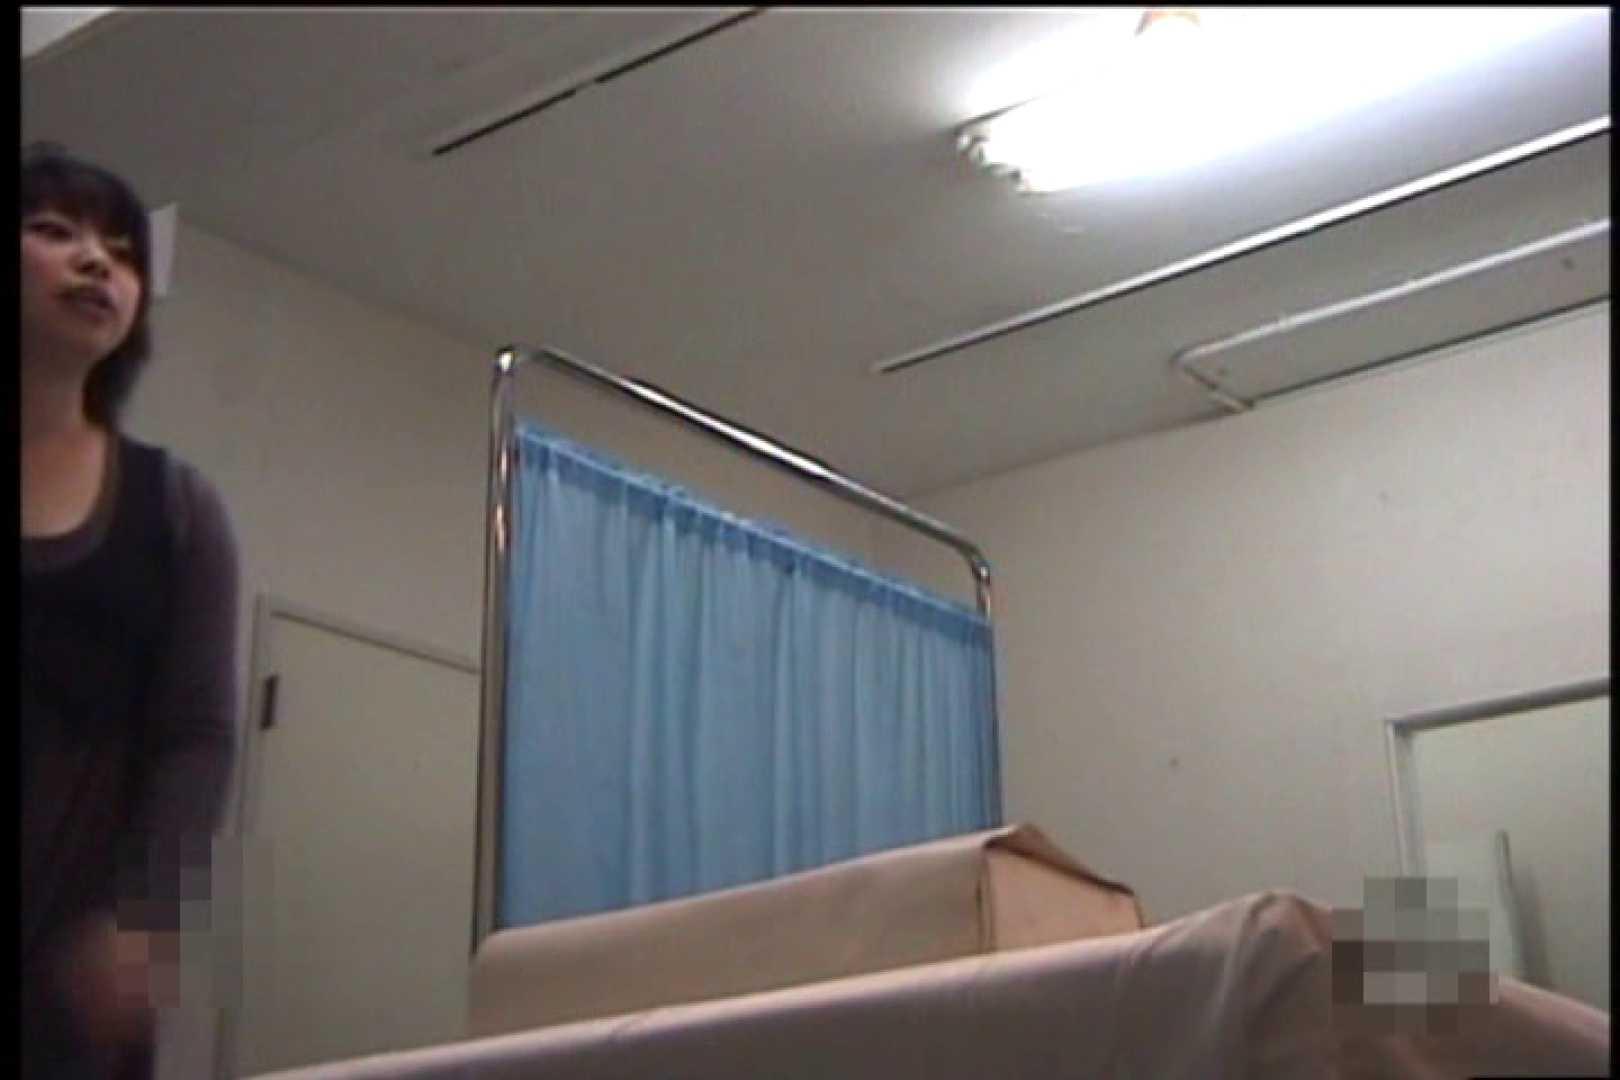 逆噴射病院 肛門科Vol.6 肛門 | OLセックス  100画像 61